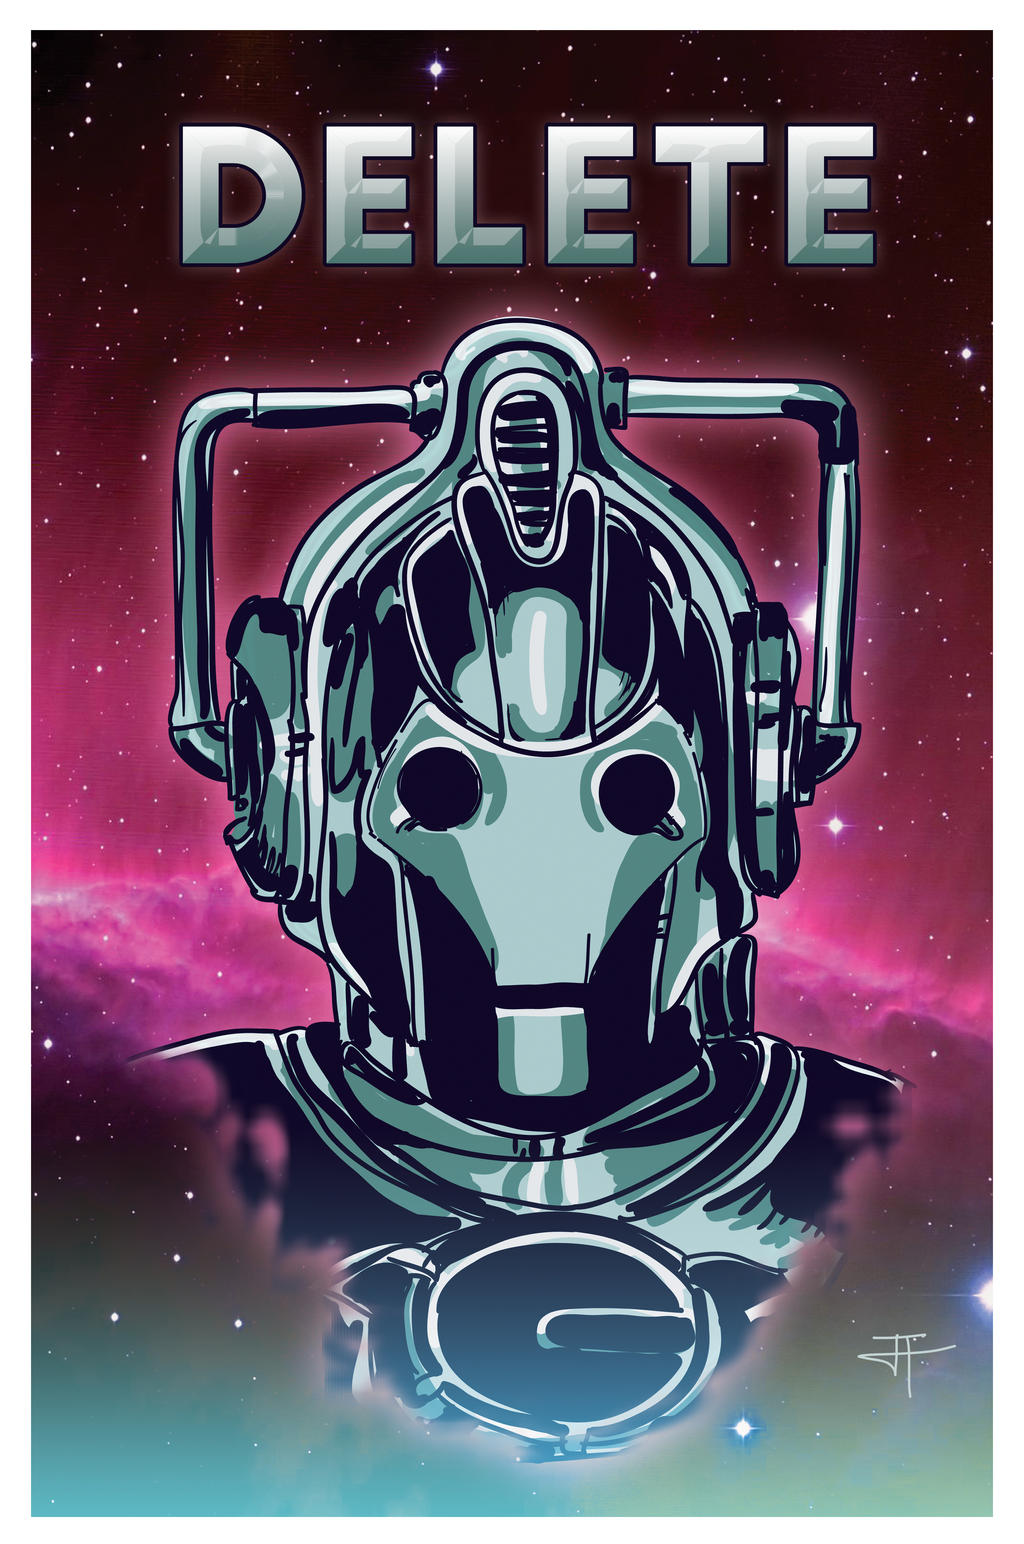 Cyberman by IronWarrior777